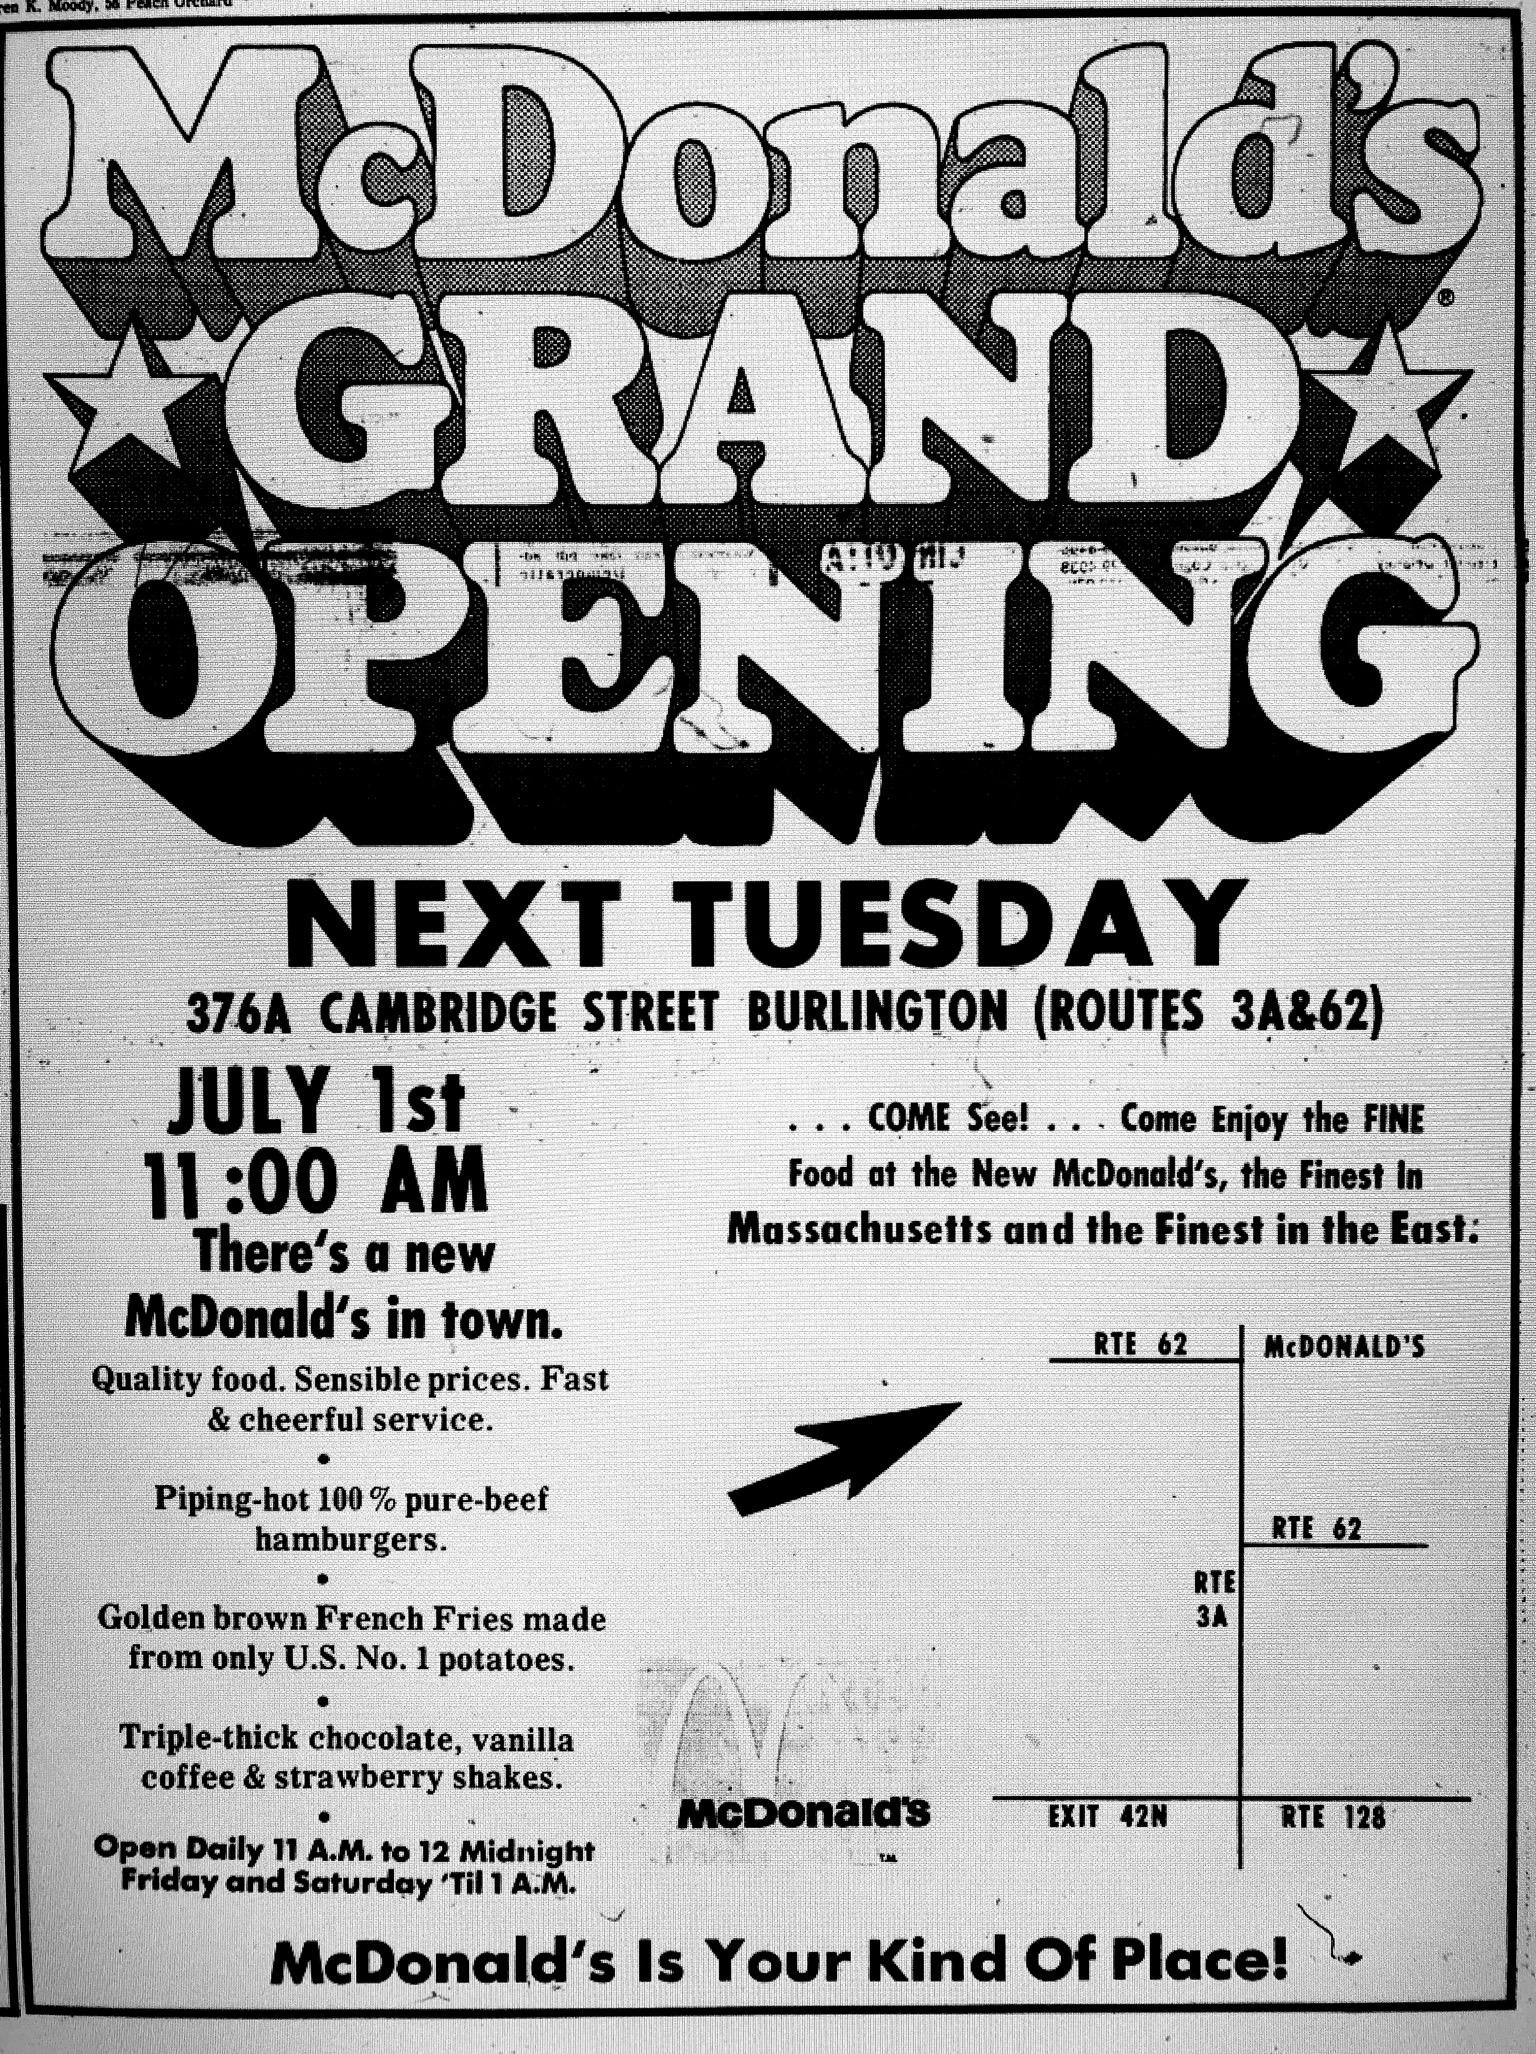 McDonald's grand opening 376A Cambridge St. Burlington MA